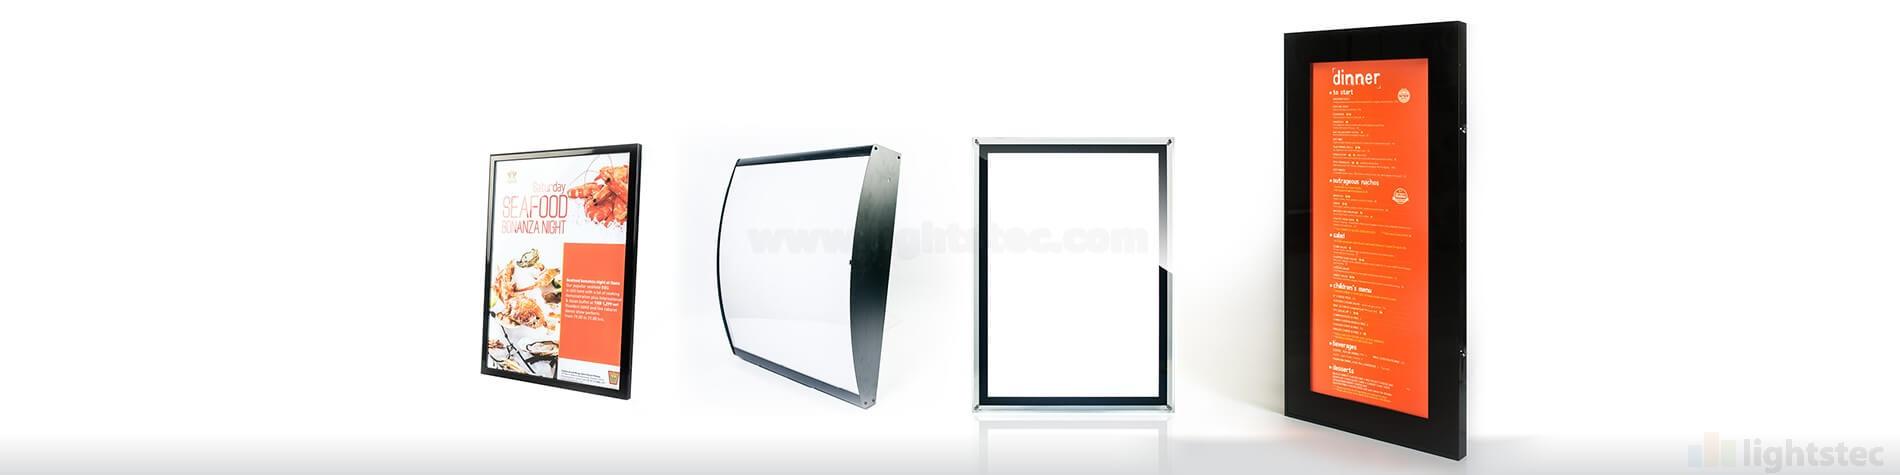 lightstec display light boxes00008